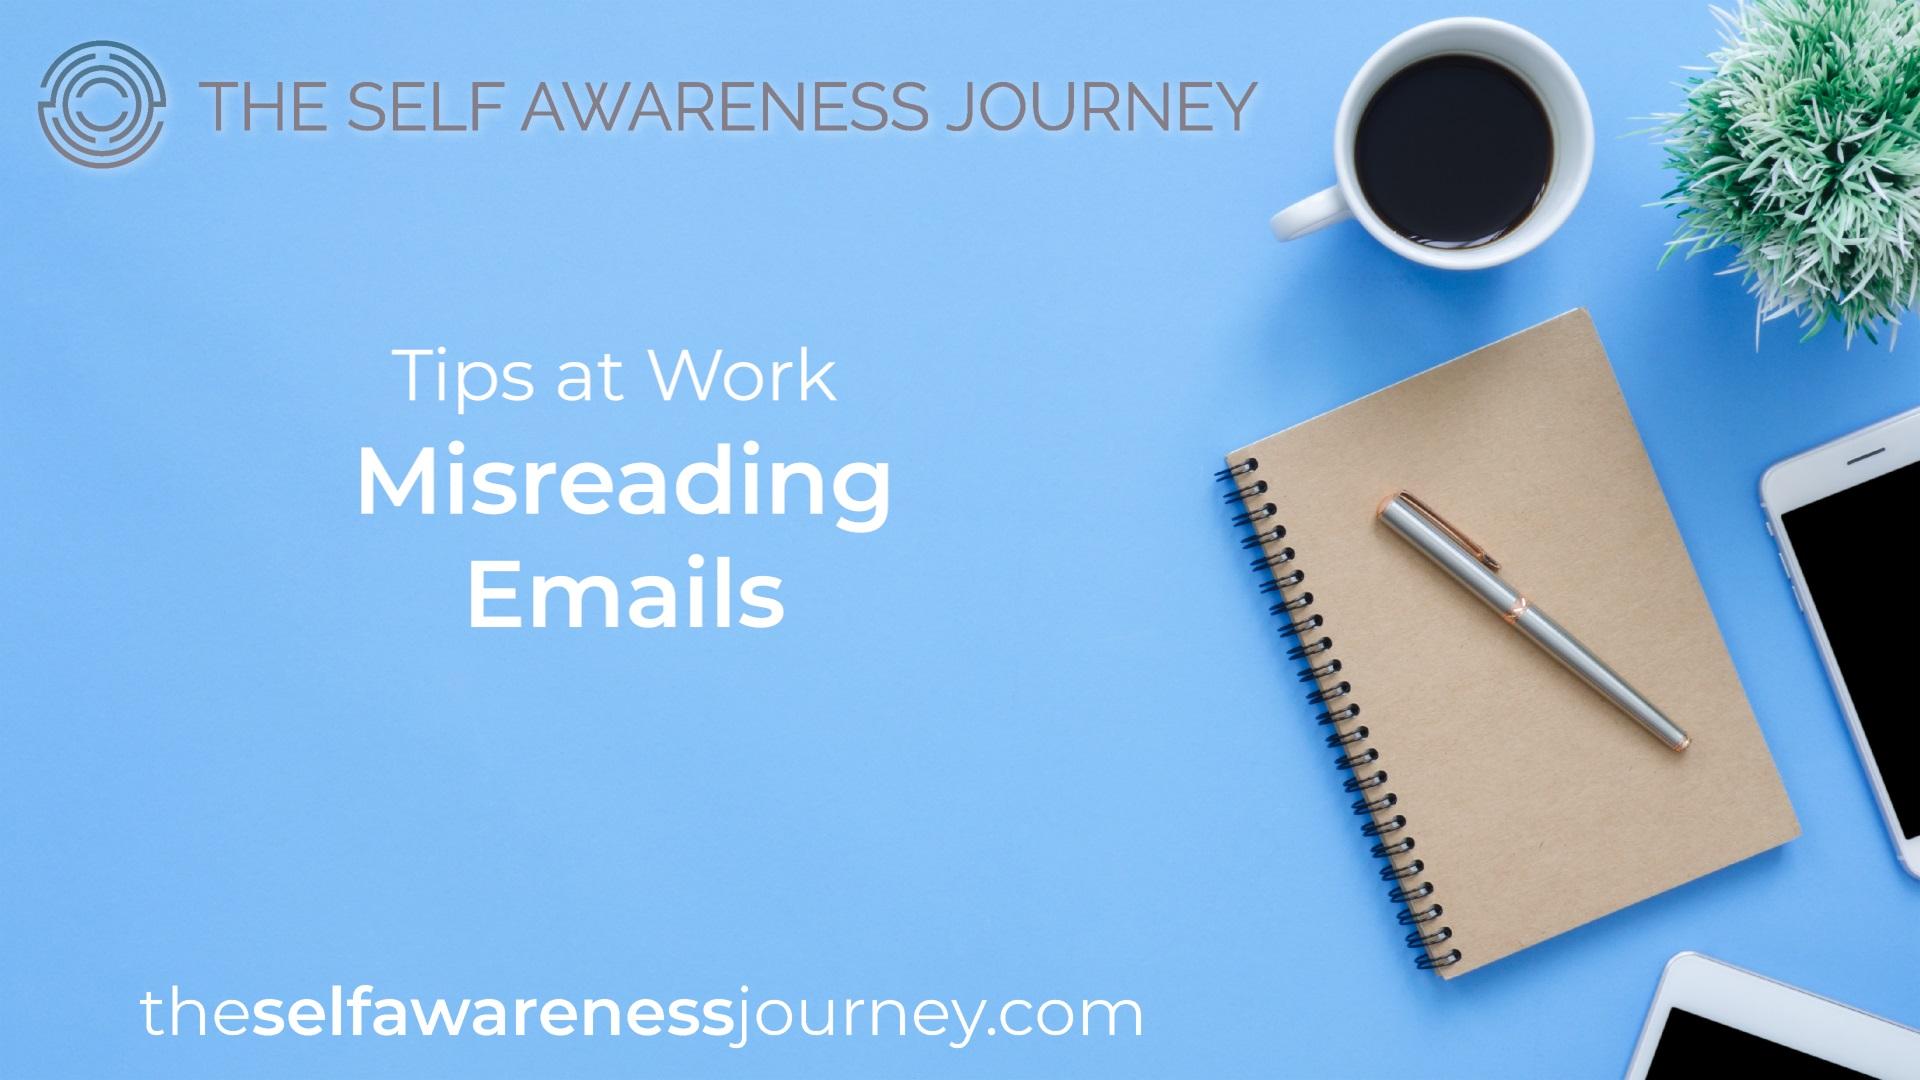 Misreading Emails